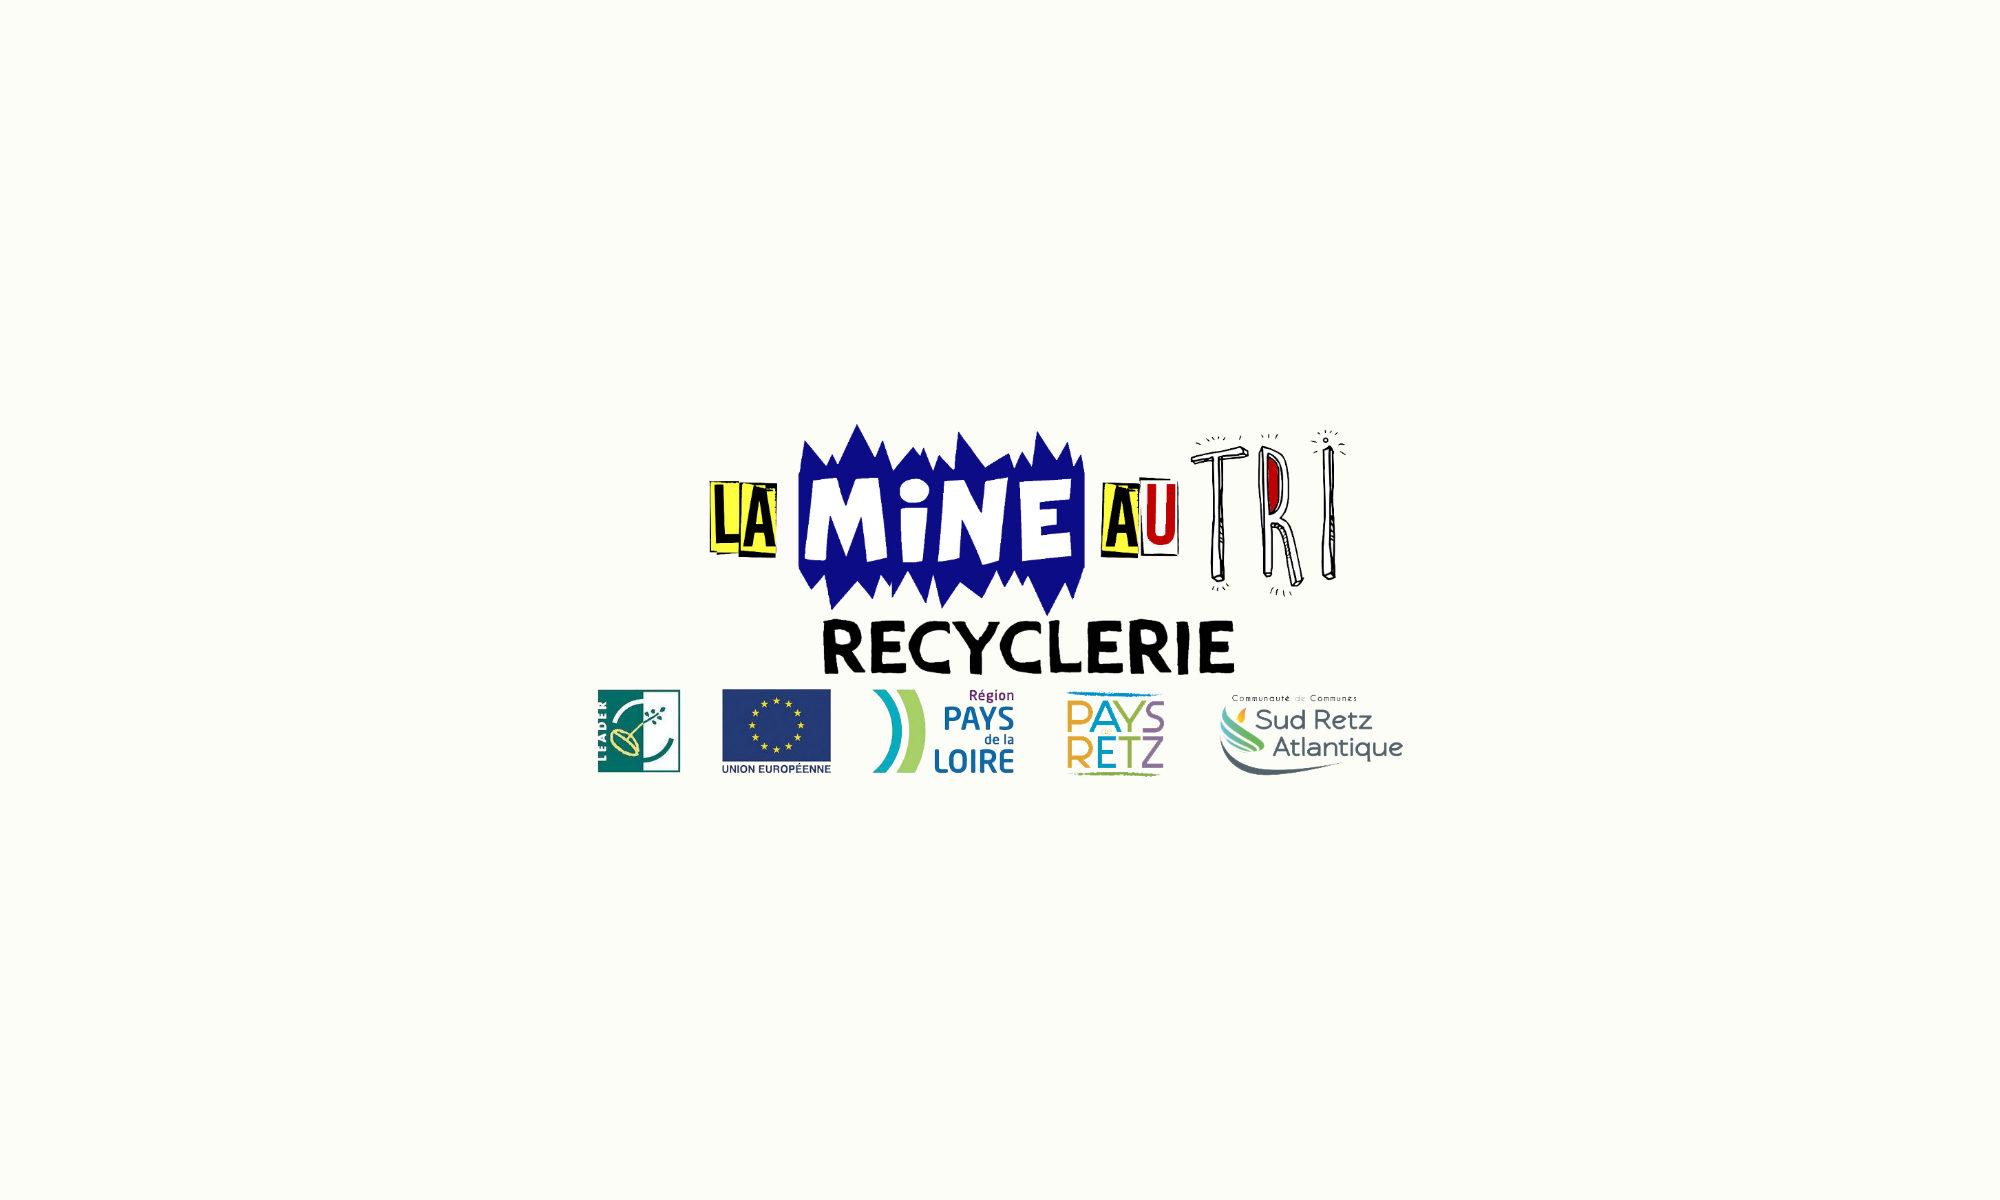 Recyclerie Le Grenier